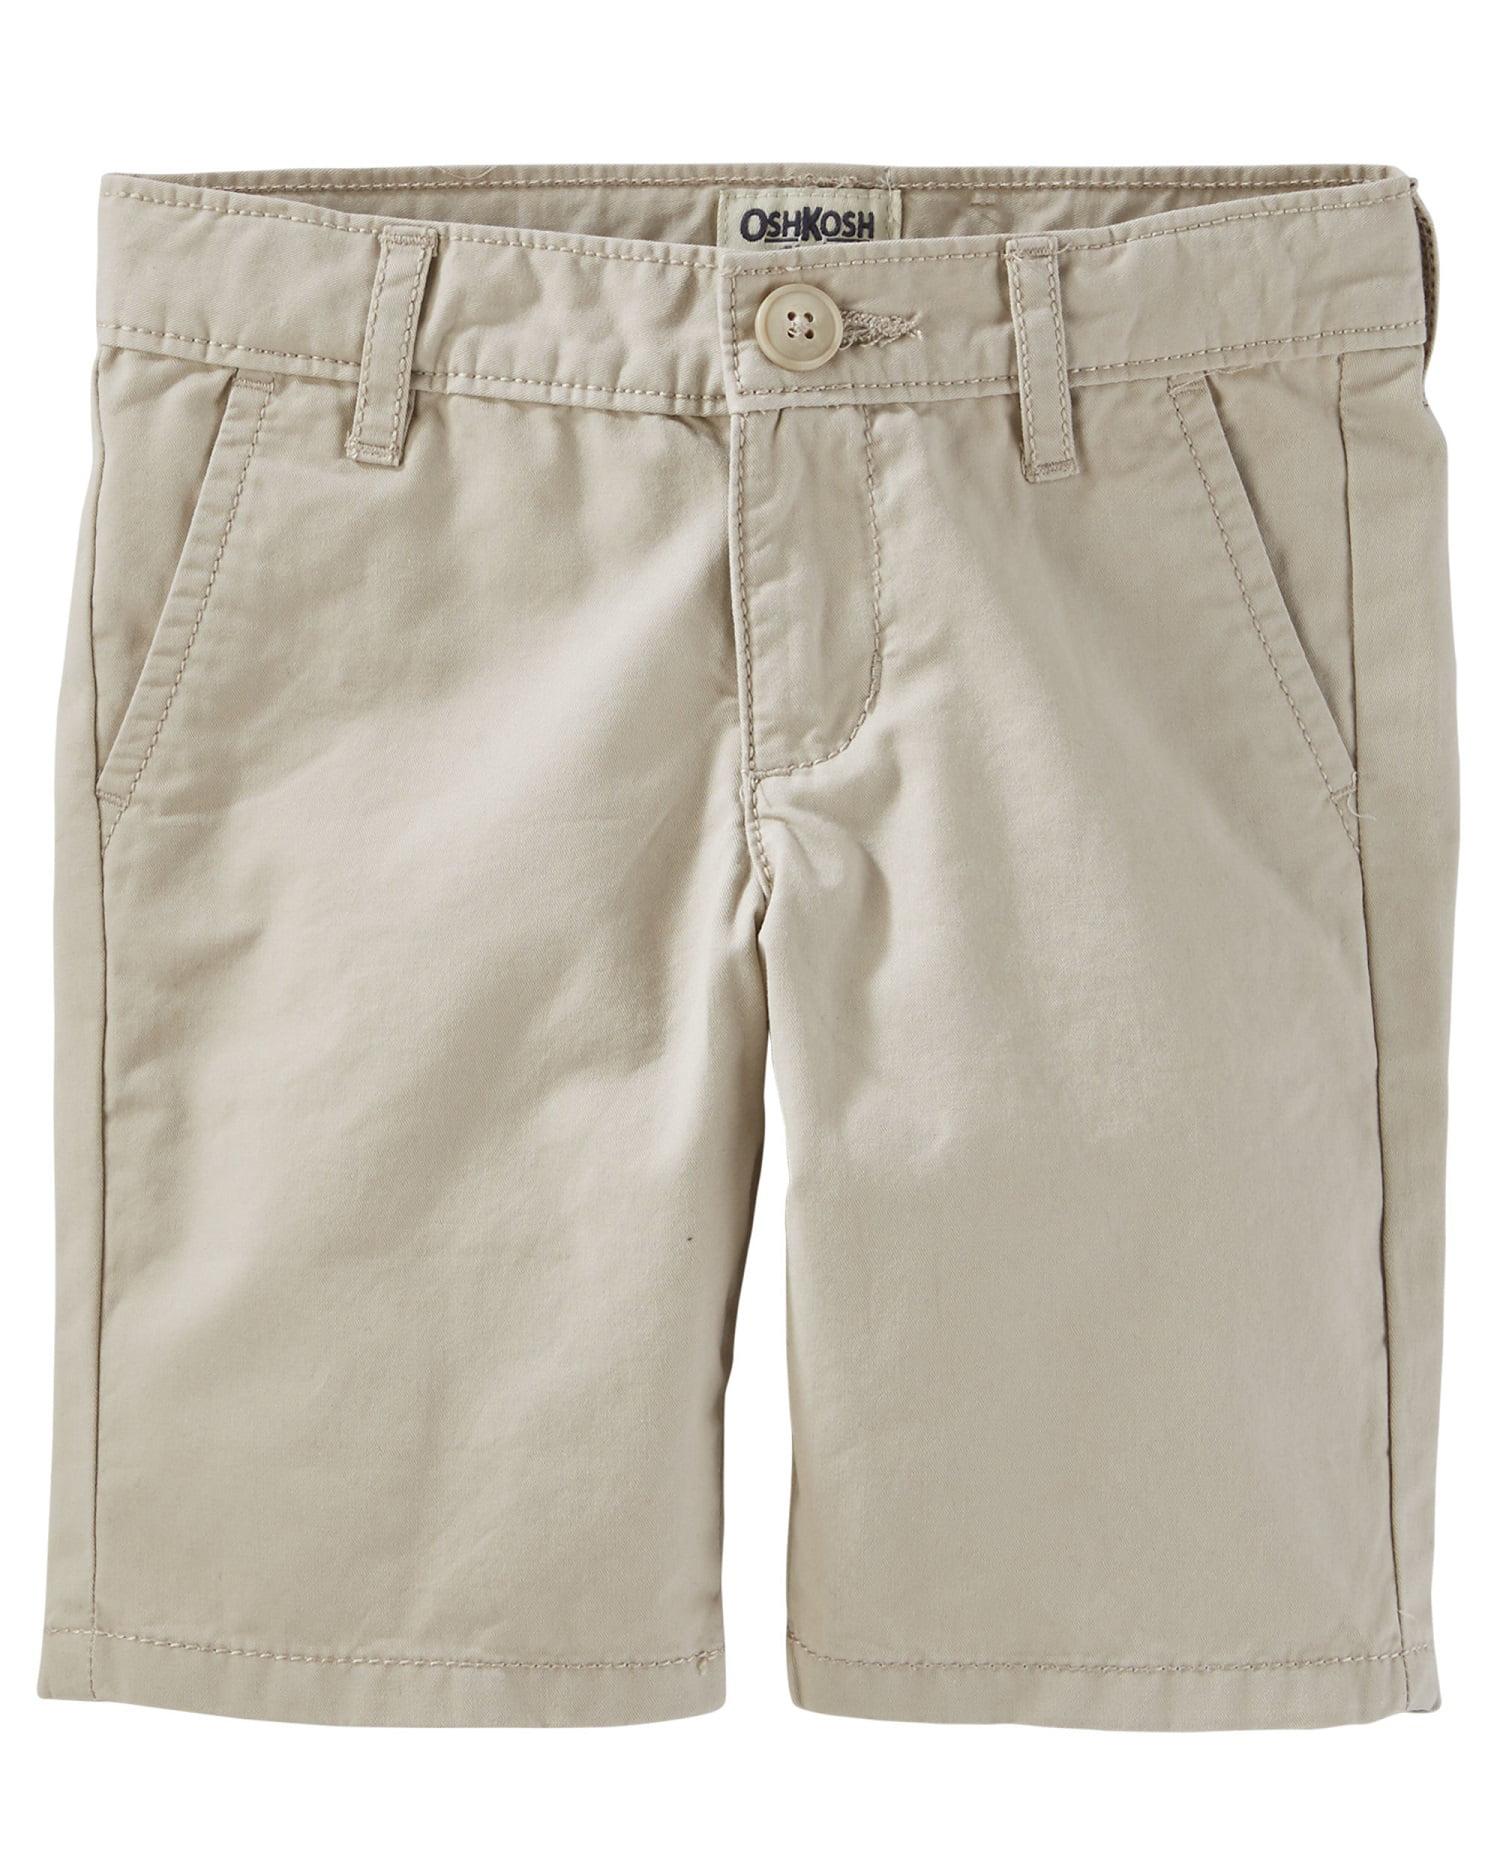 OshKosh B'gosh Little Girls' Classic Fit Uniform Shorts, 6 Kids